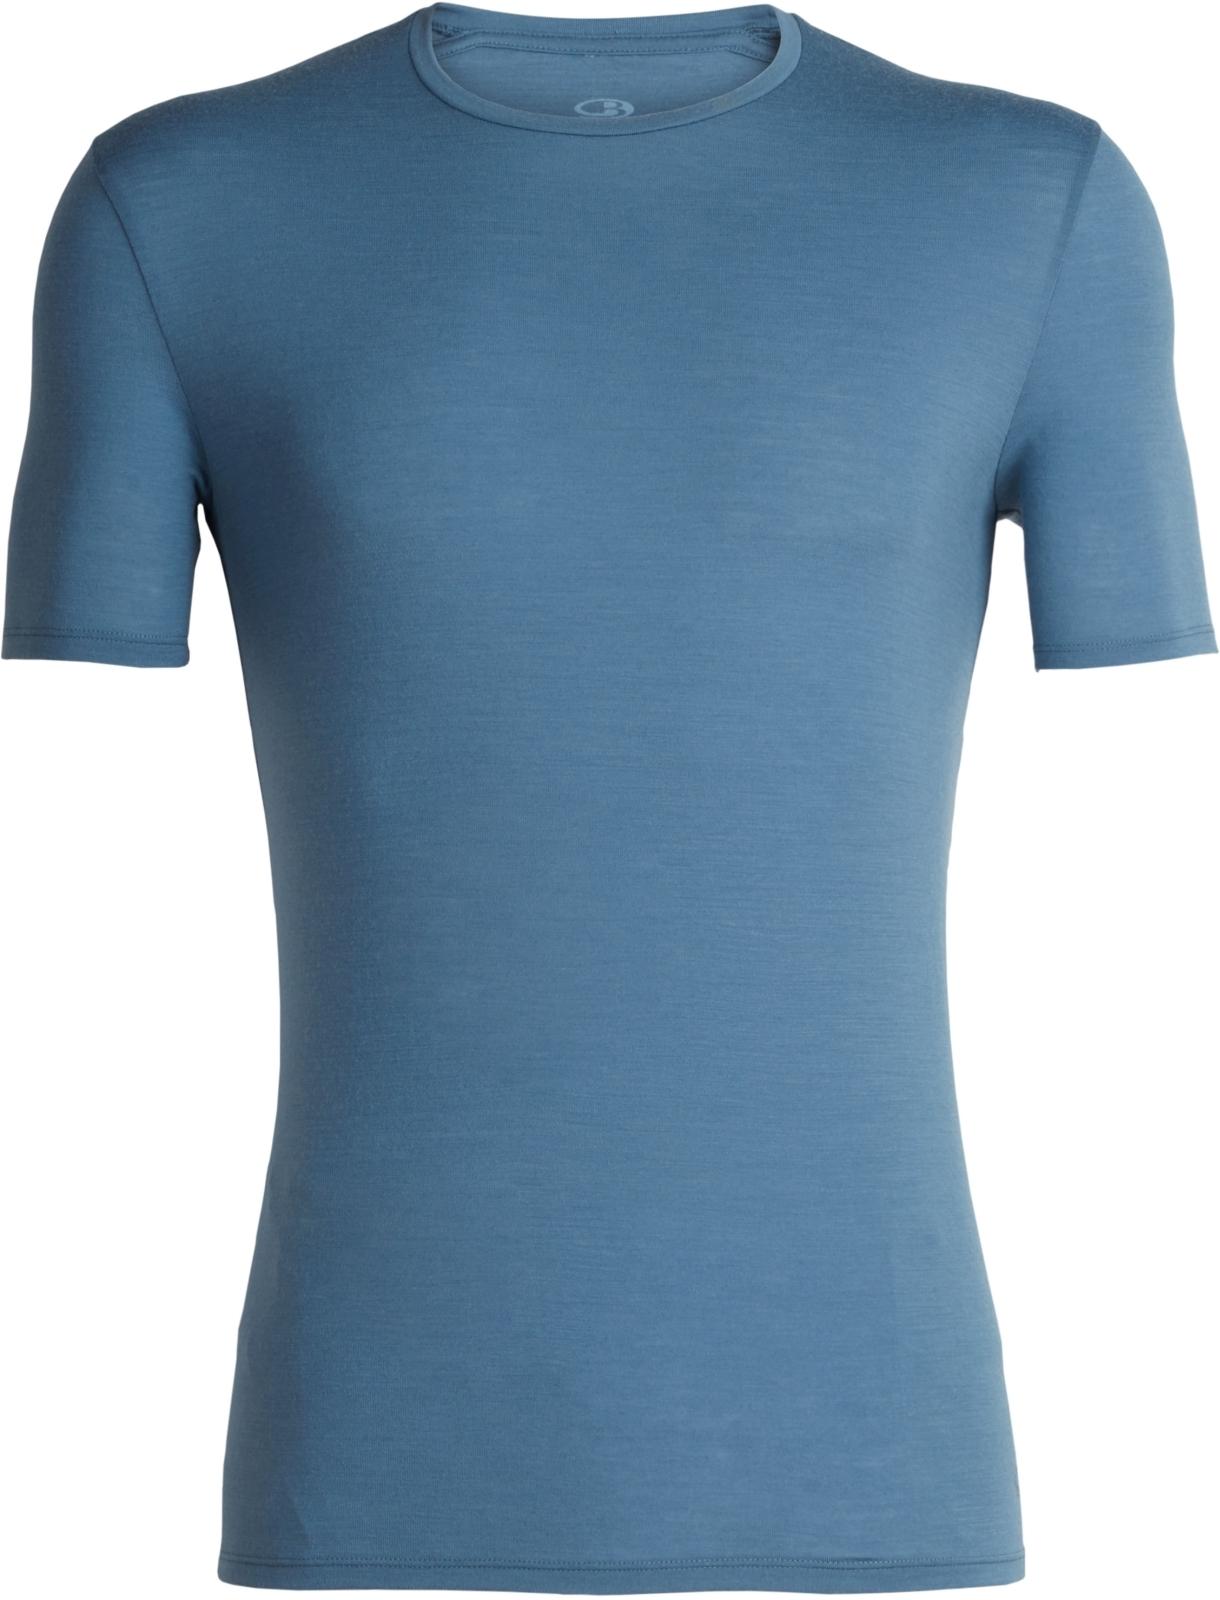 Pánské funkční triko s krátkým rukávem Icebreaker Mens Anatomica SS Crewe -  granite blue 9fb045c6b8